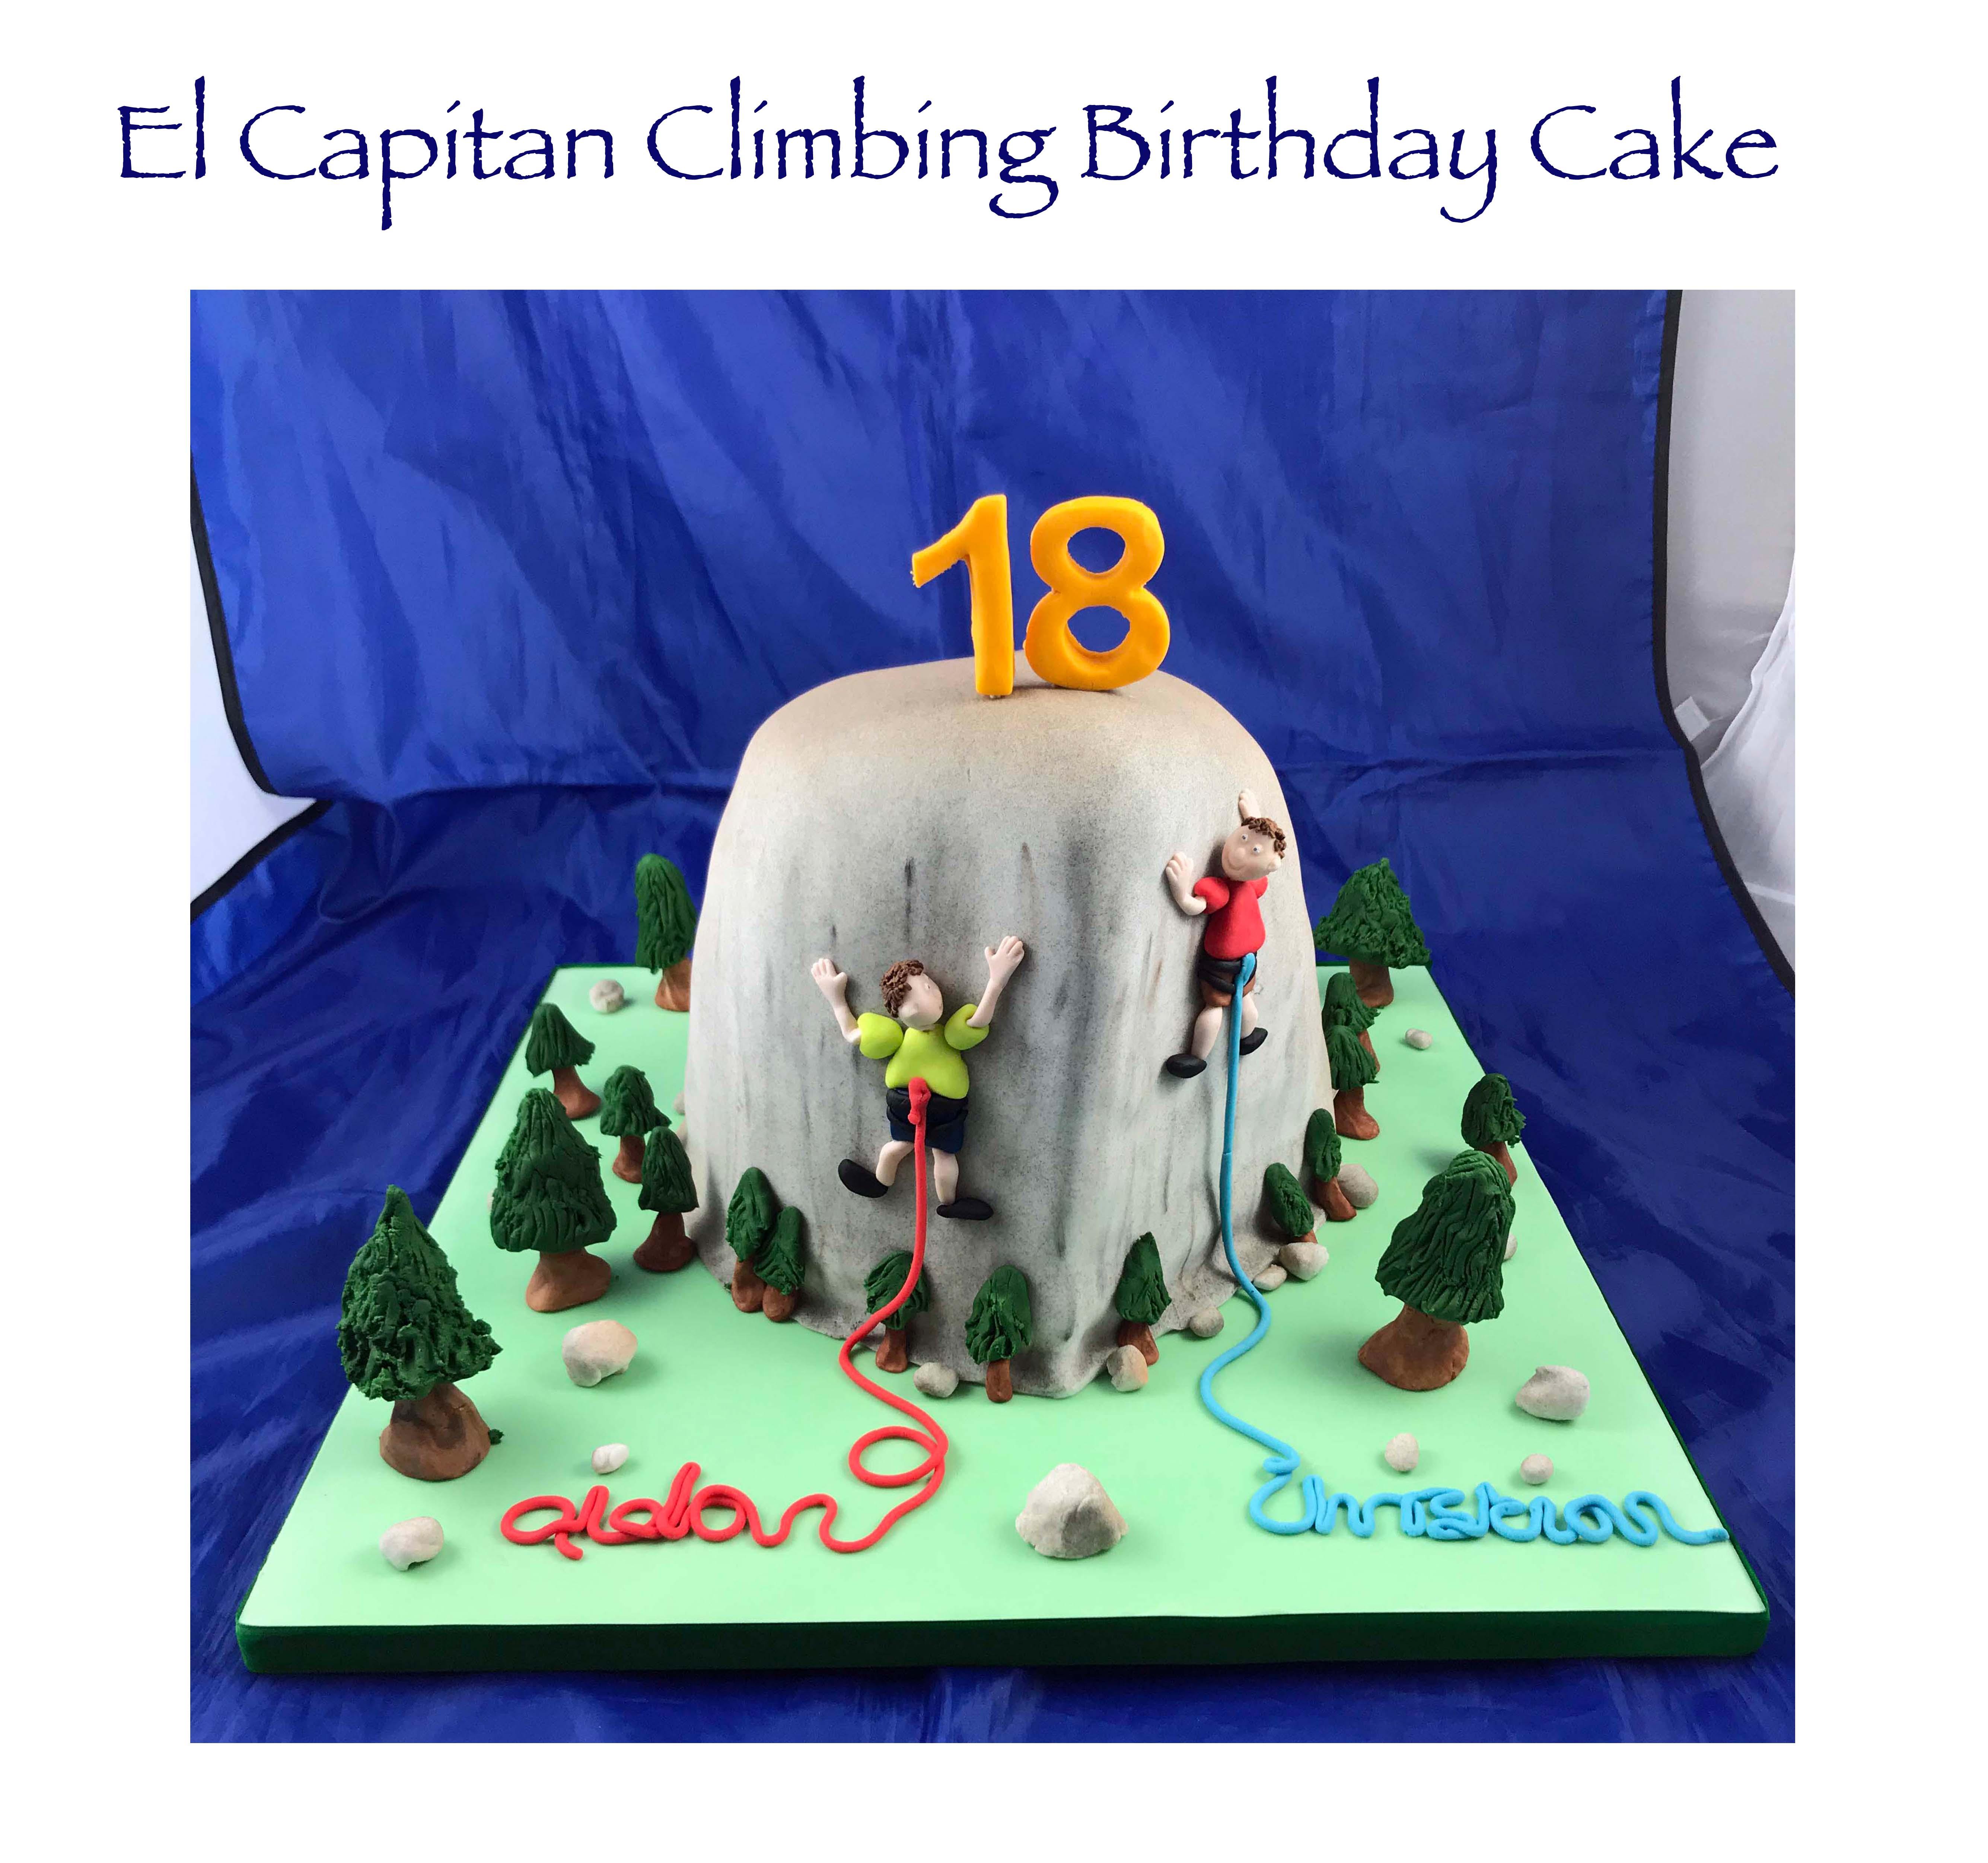 El Capitan Climbing Birthday Cake